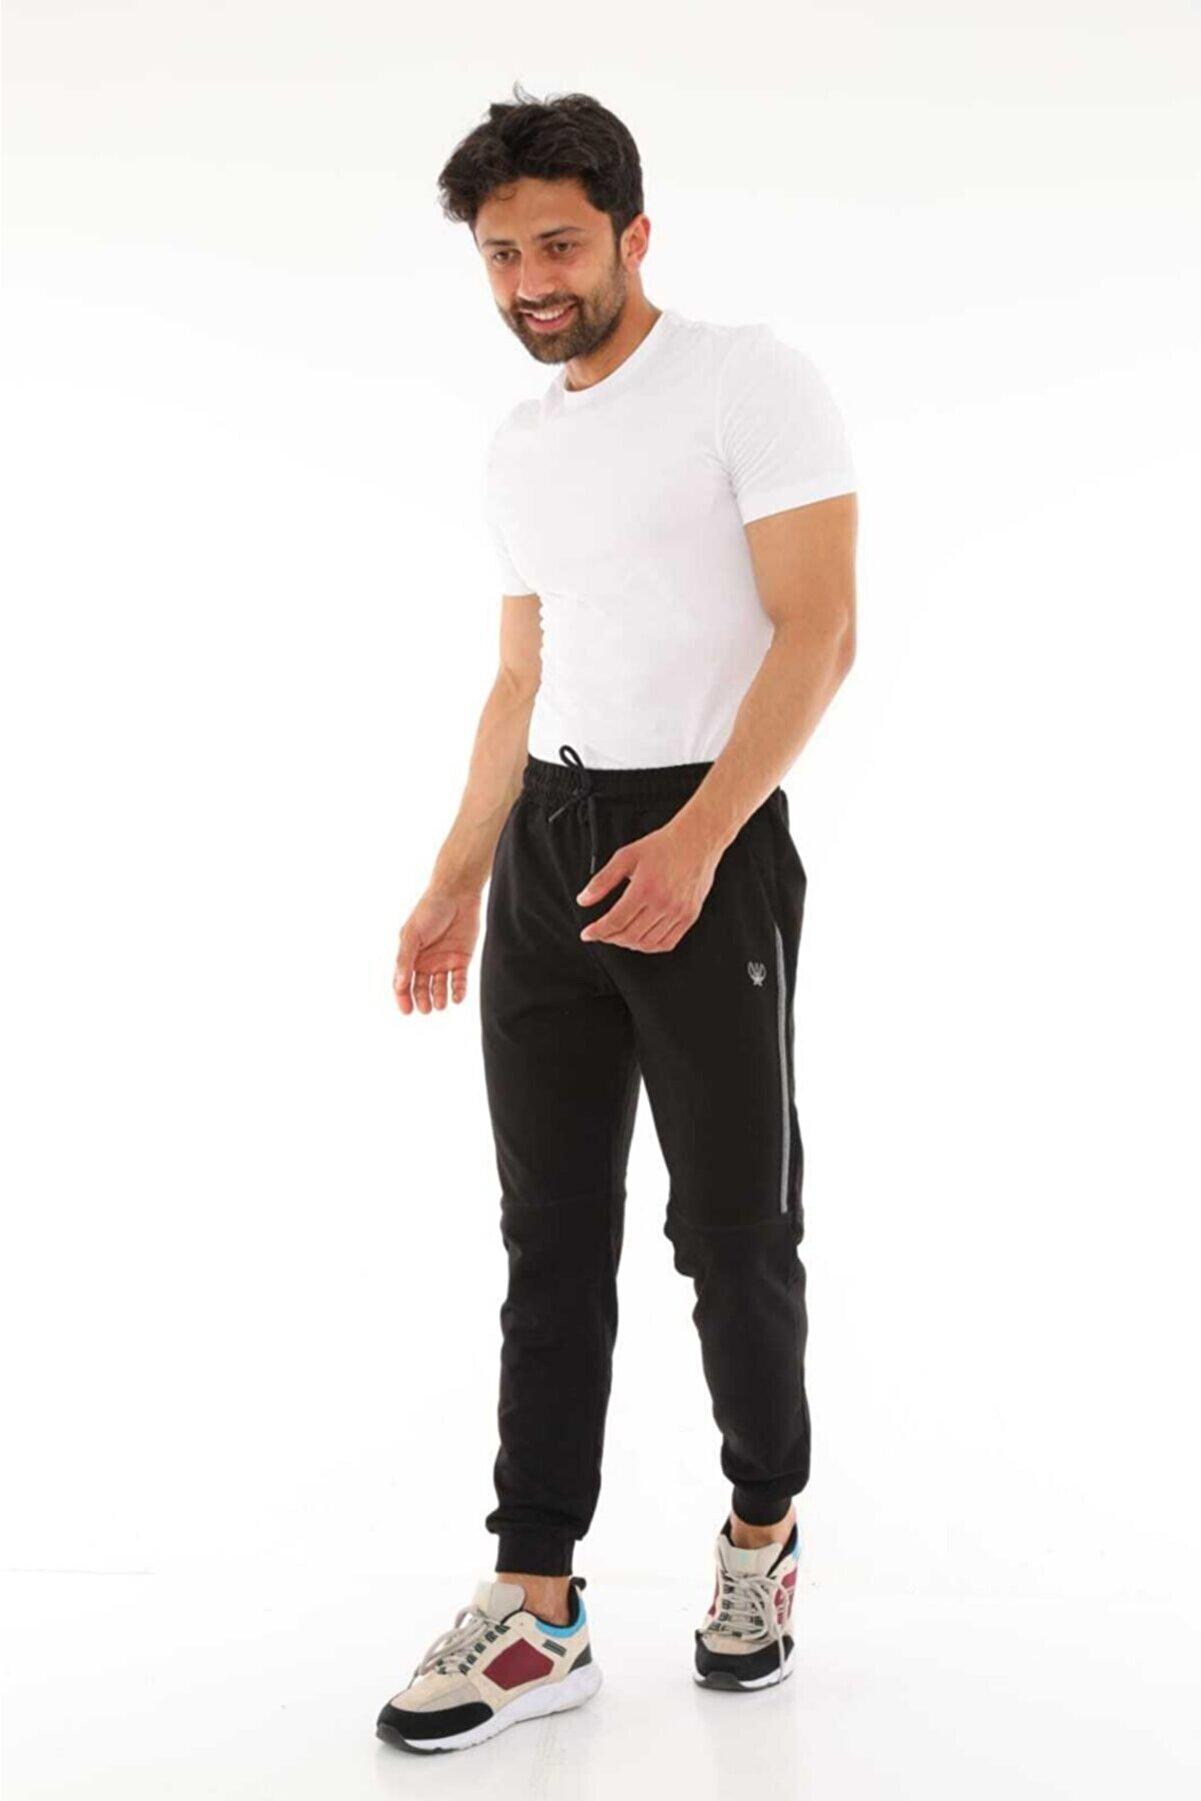 whitestar Unisex Siyah Eşofman Altı